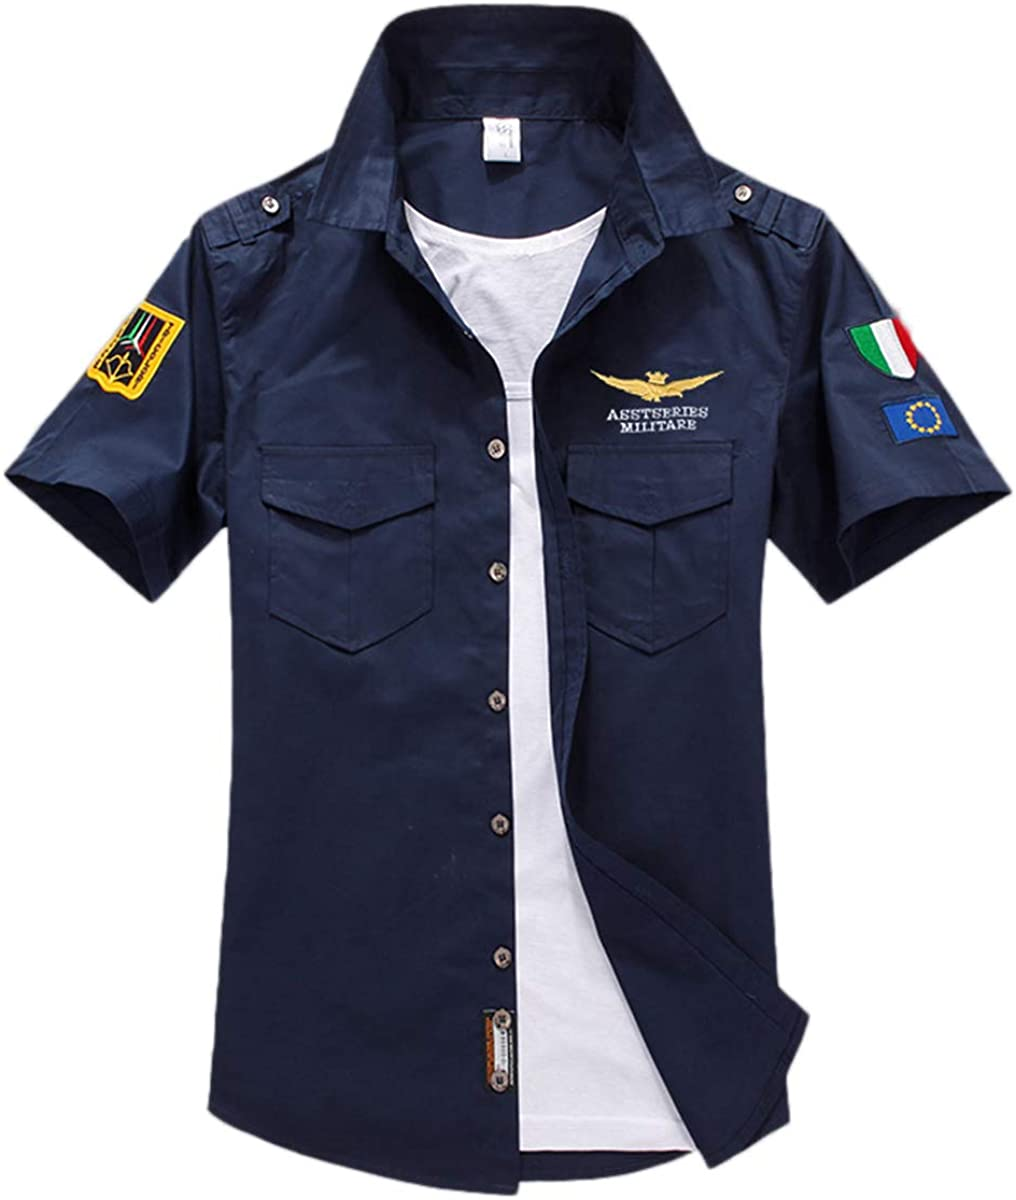 Camiseta Corta de Hombre, Camisa de algodón, Camisa de Manga ...